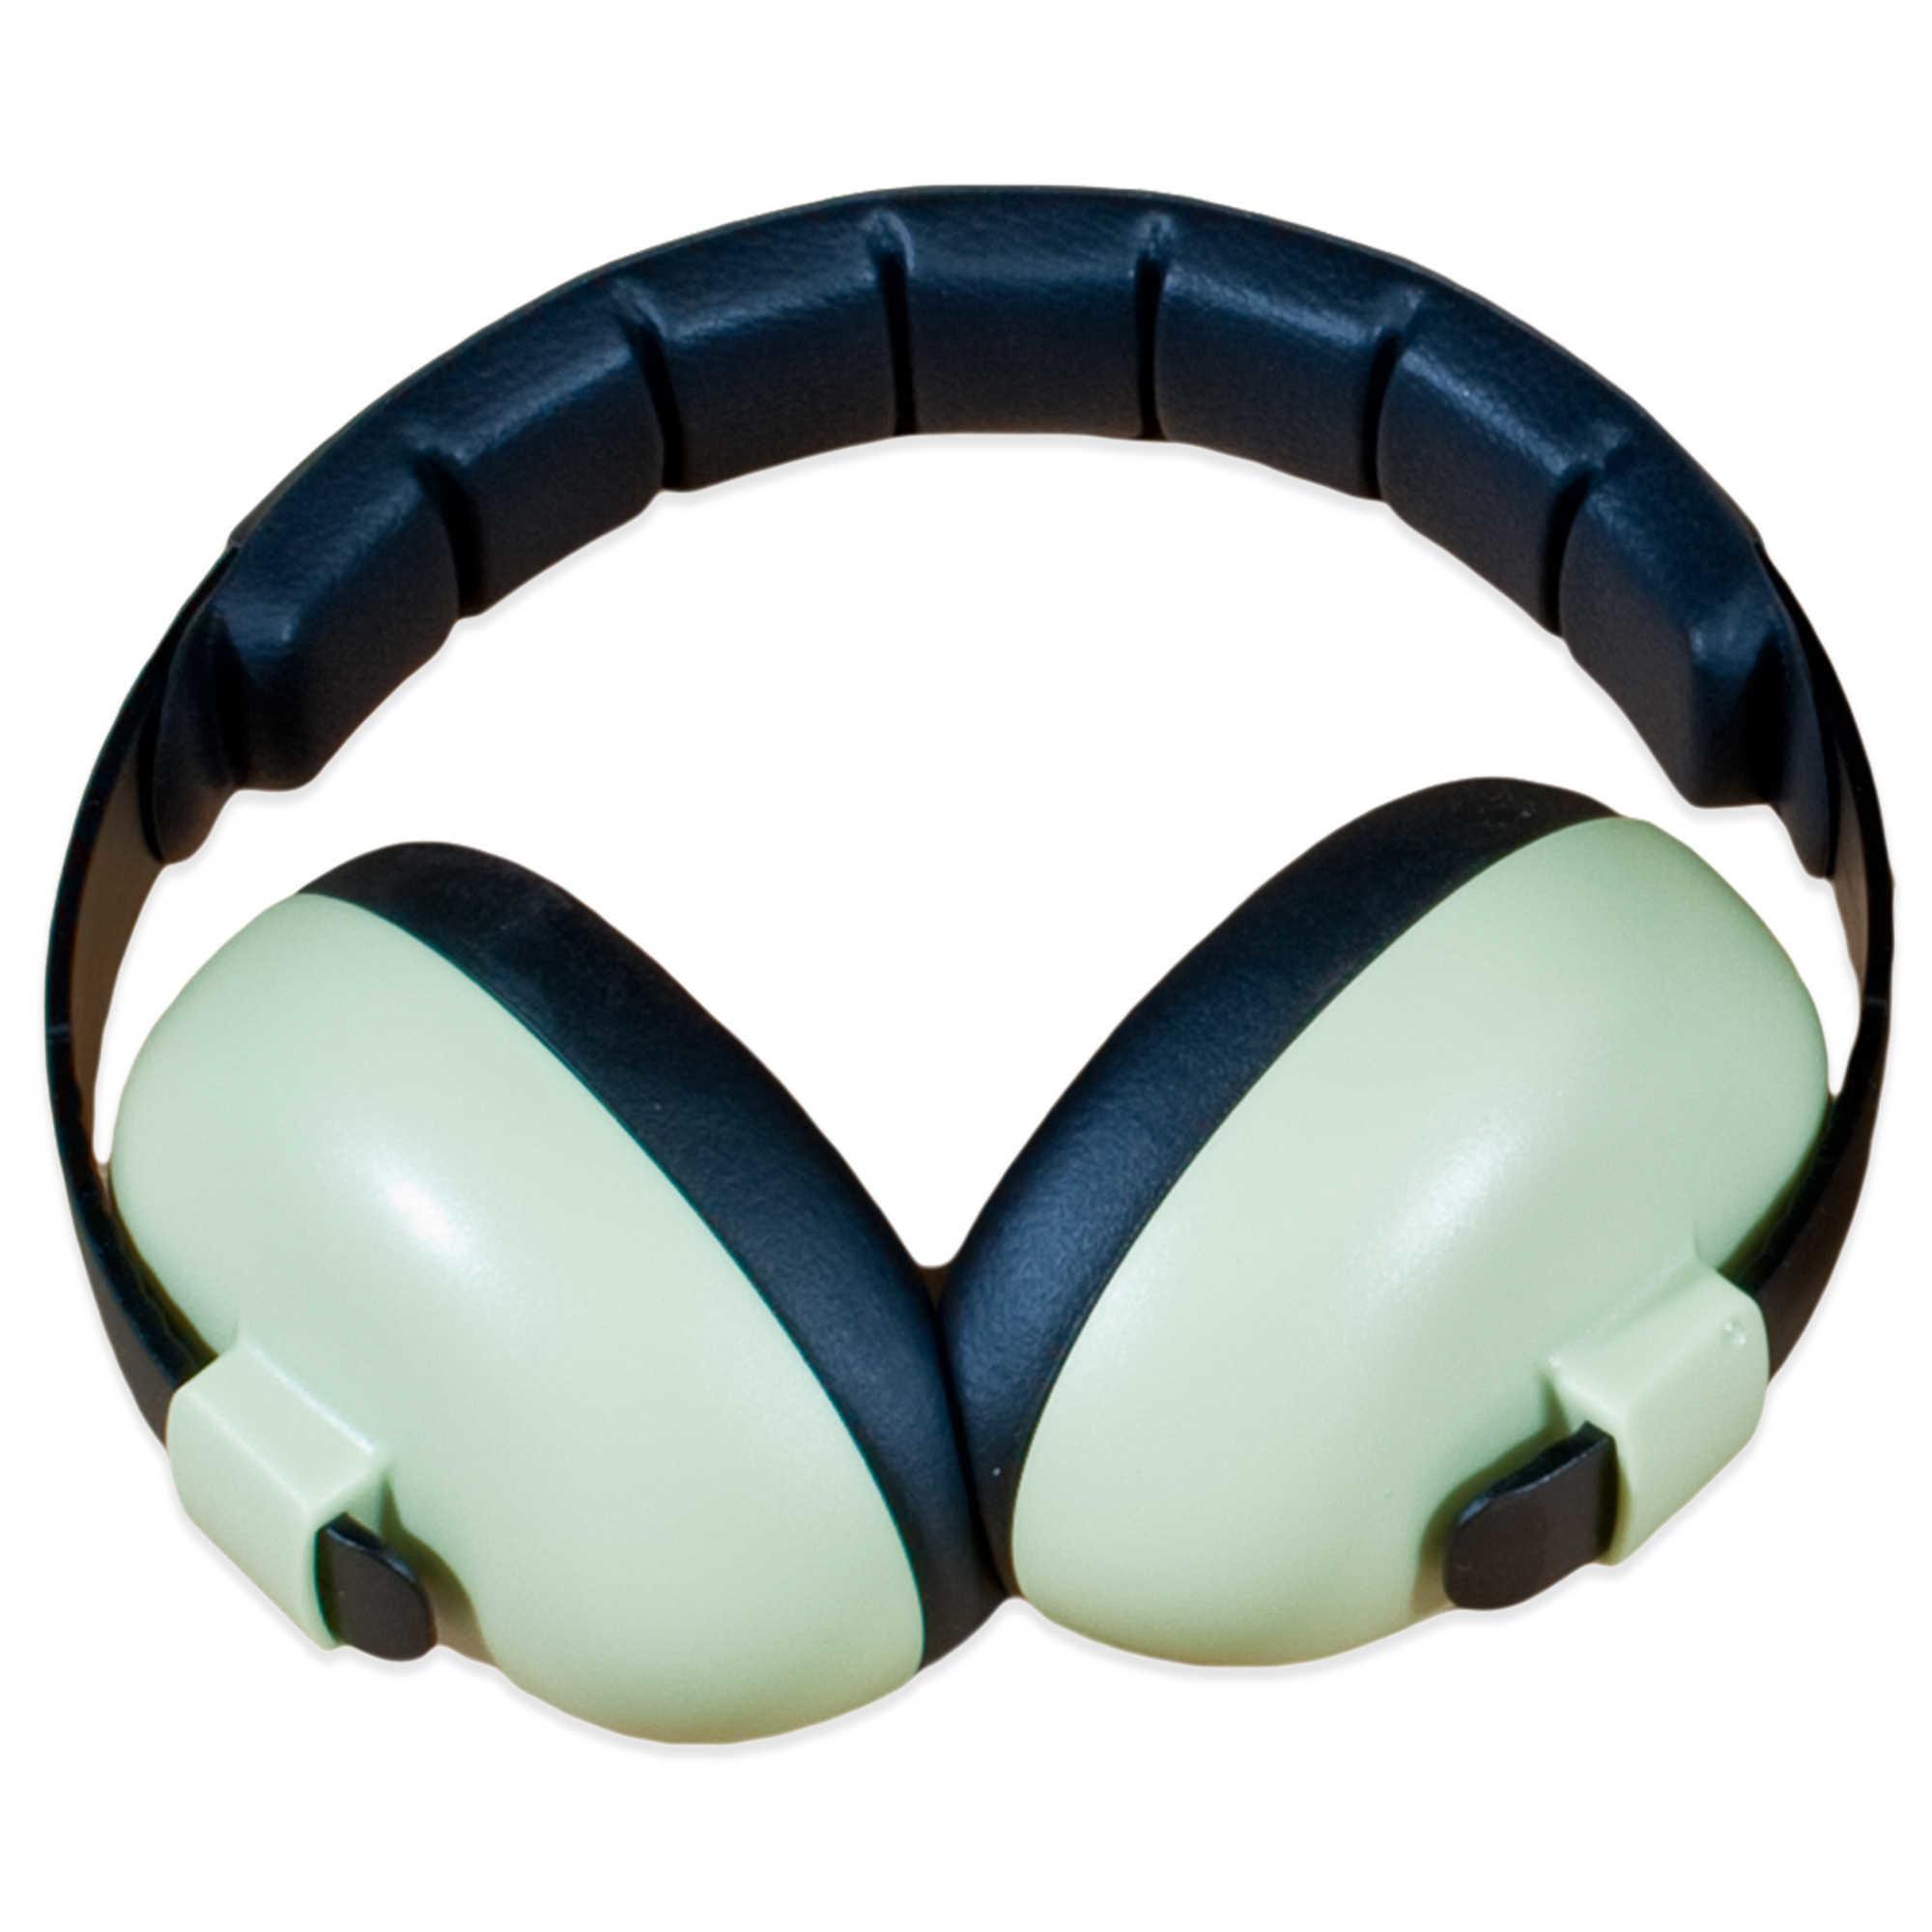 Banz USA Infant Hearing Protection